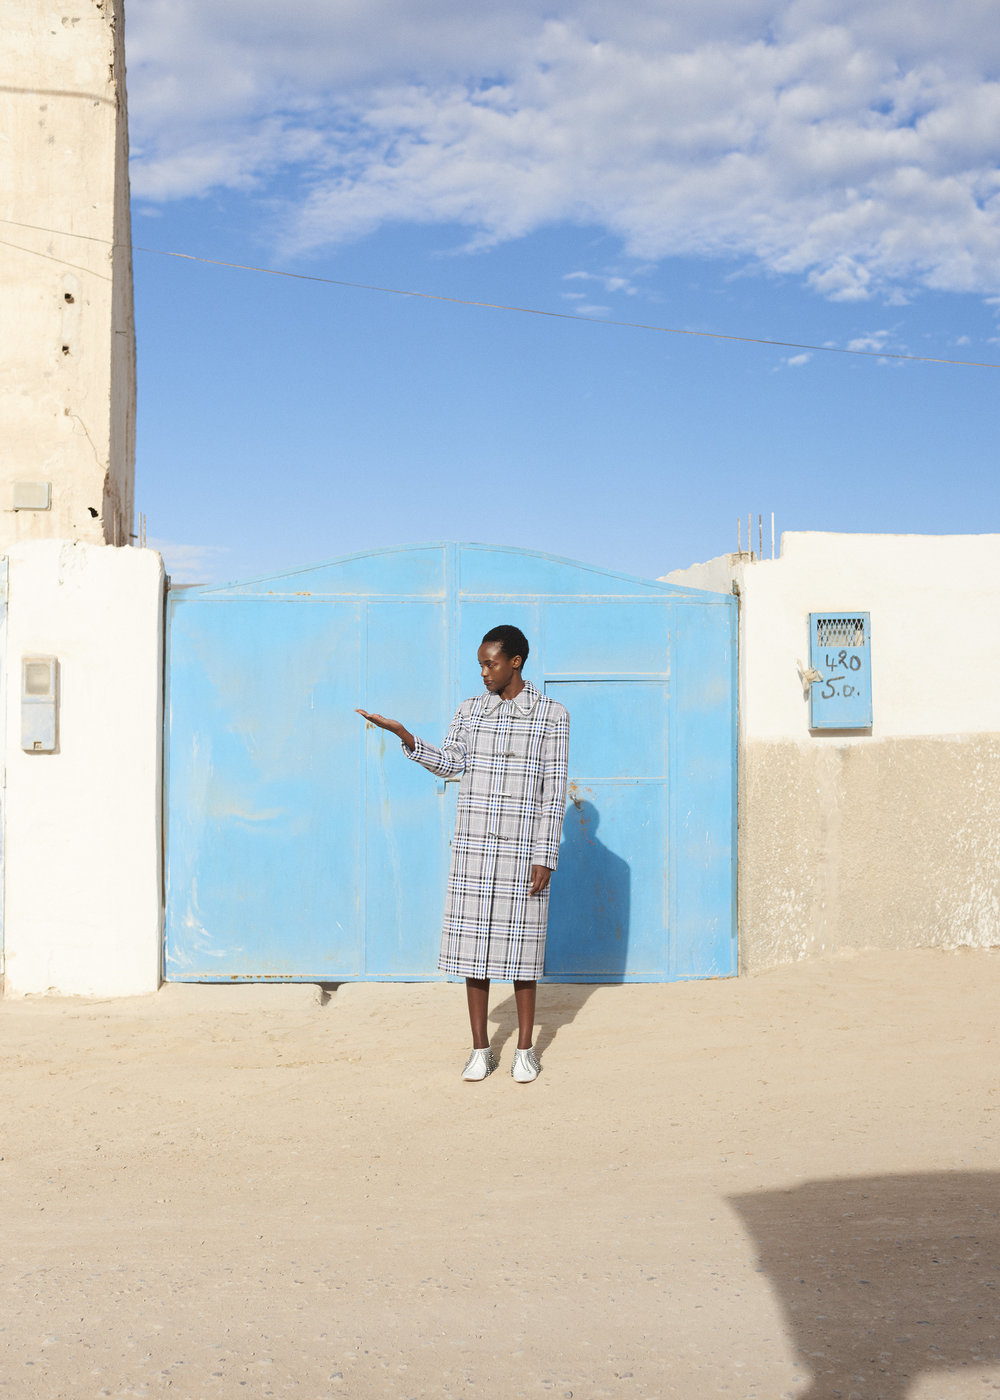 VMAG__bridget-fleming__Morocco_L08.jpg